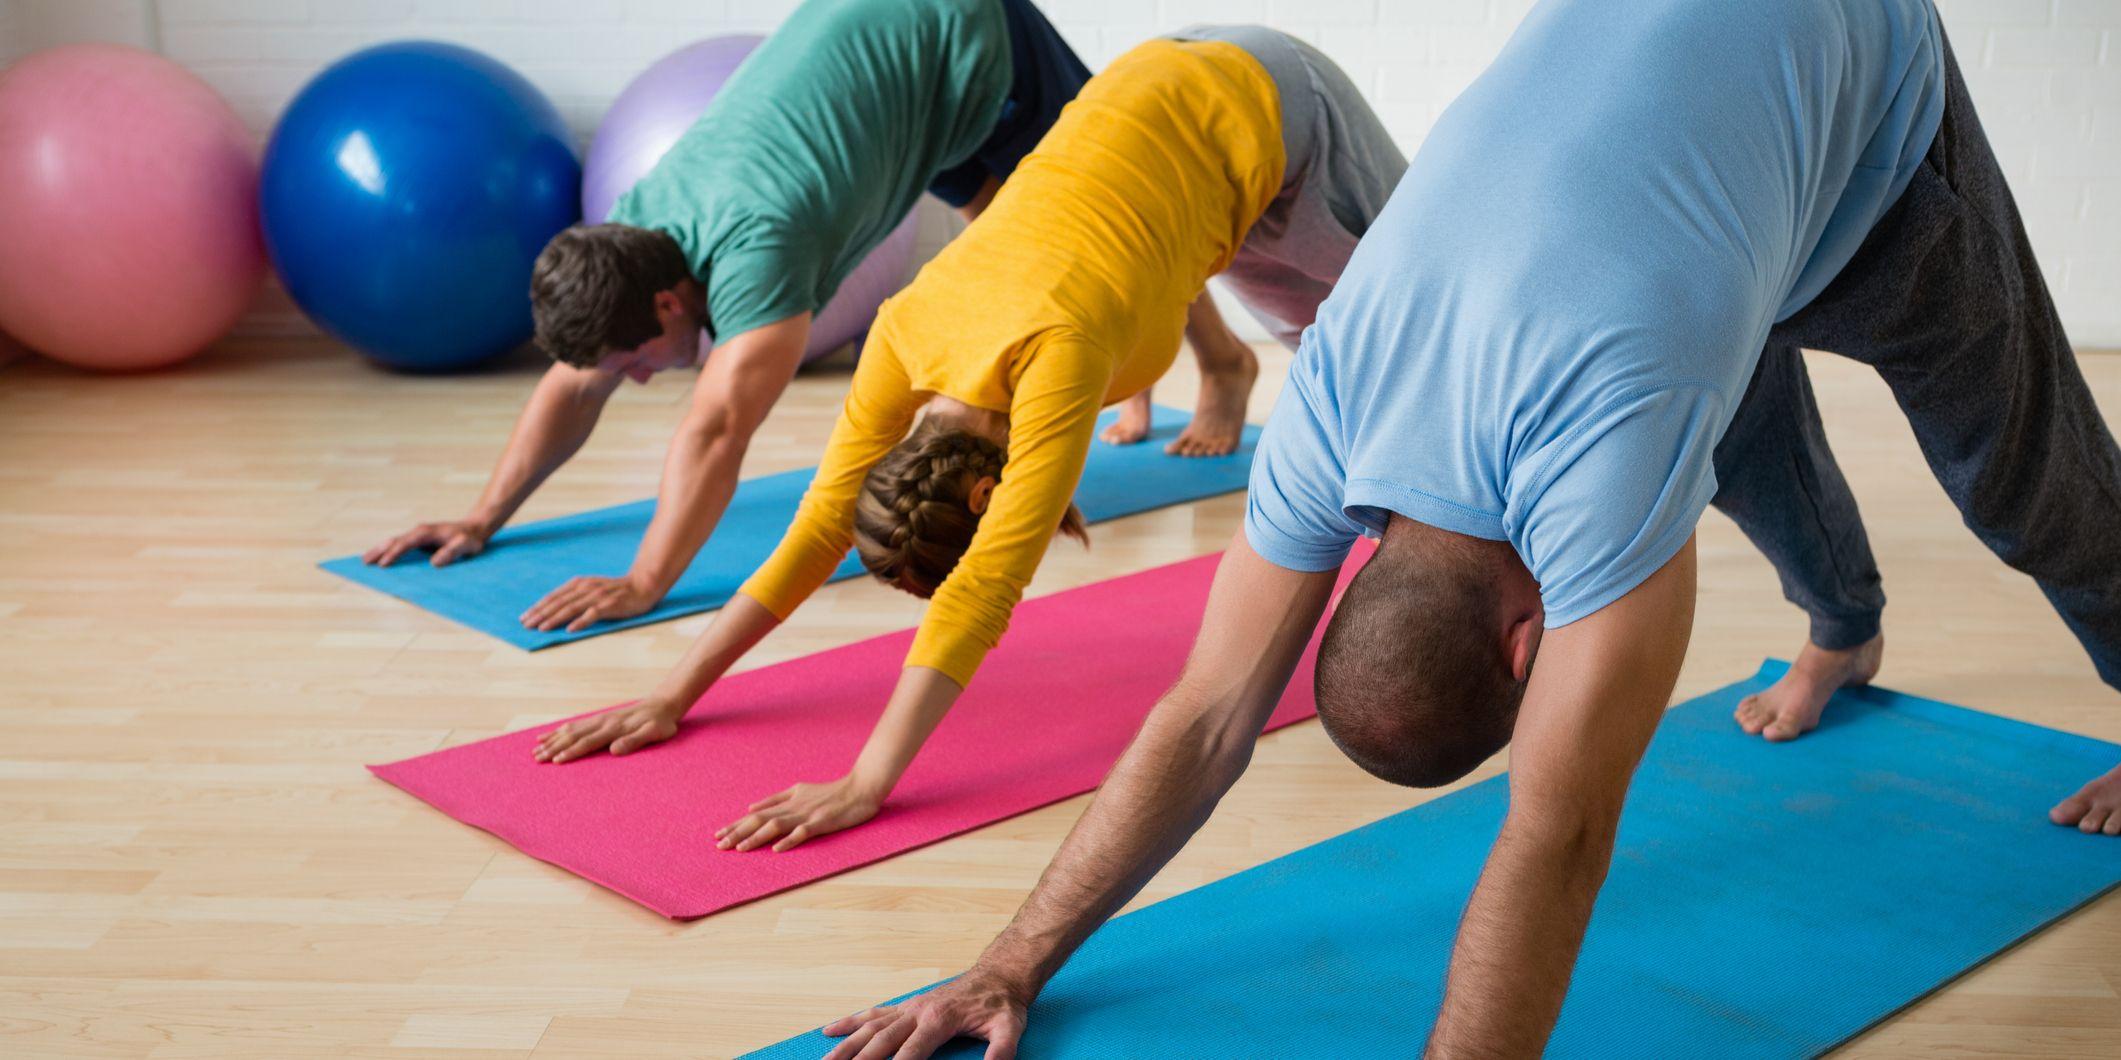 upper back pain treatment tips